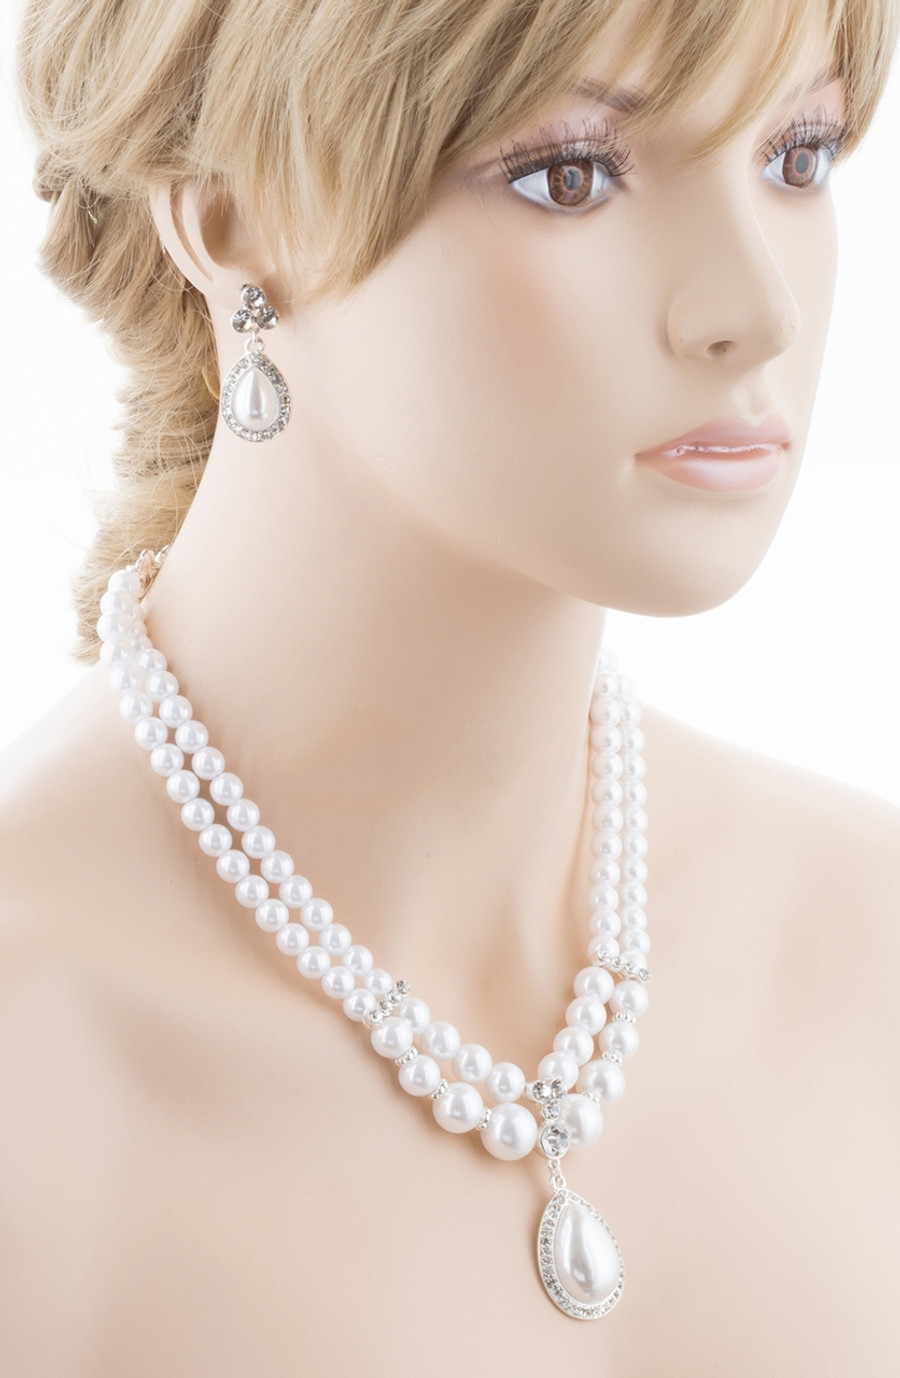 Bridal Wedding Jewelry Crystal Rhinestone Pearl Teardrop Necklace Set J704 SV